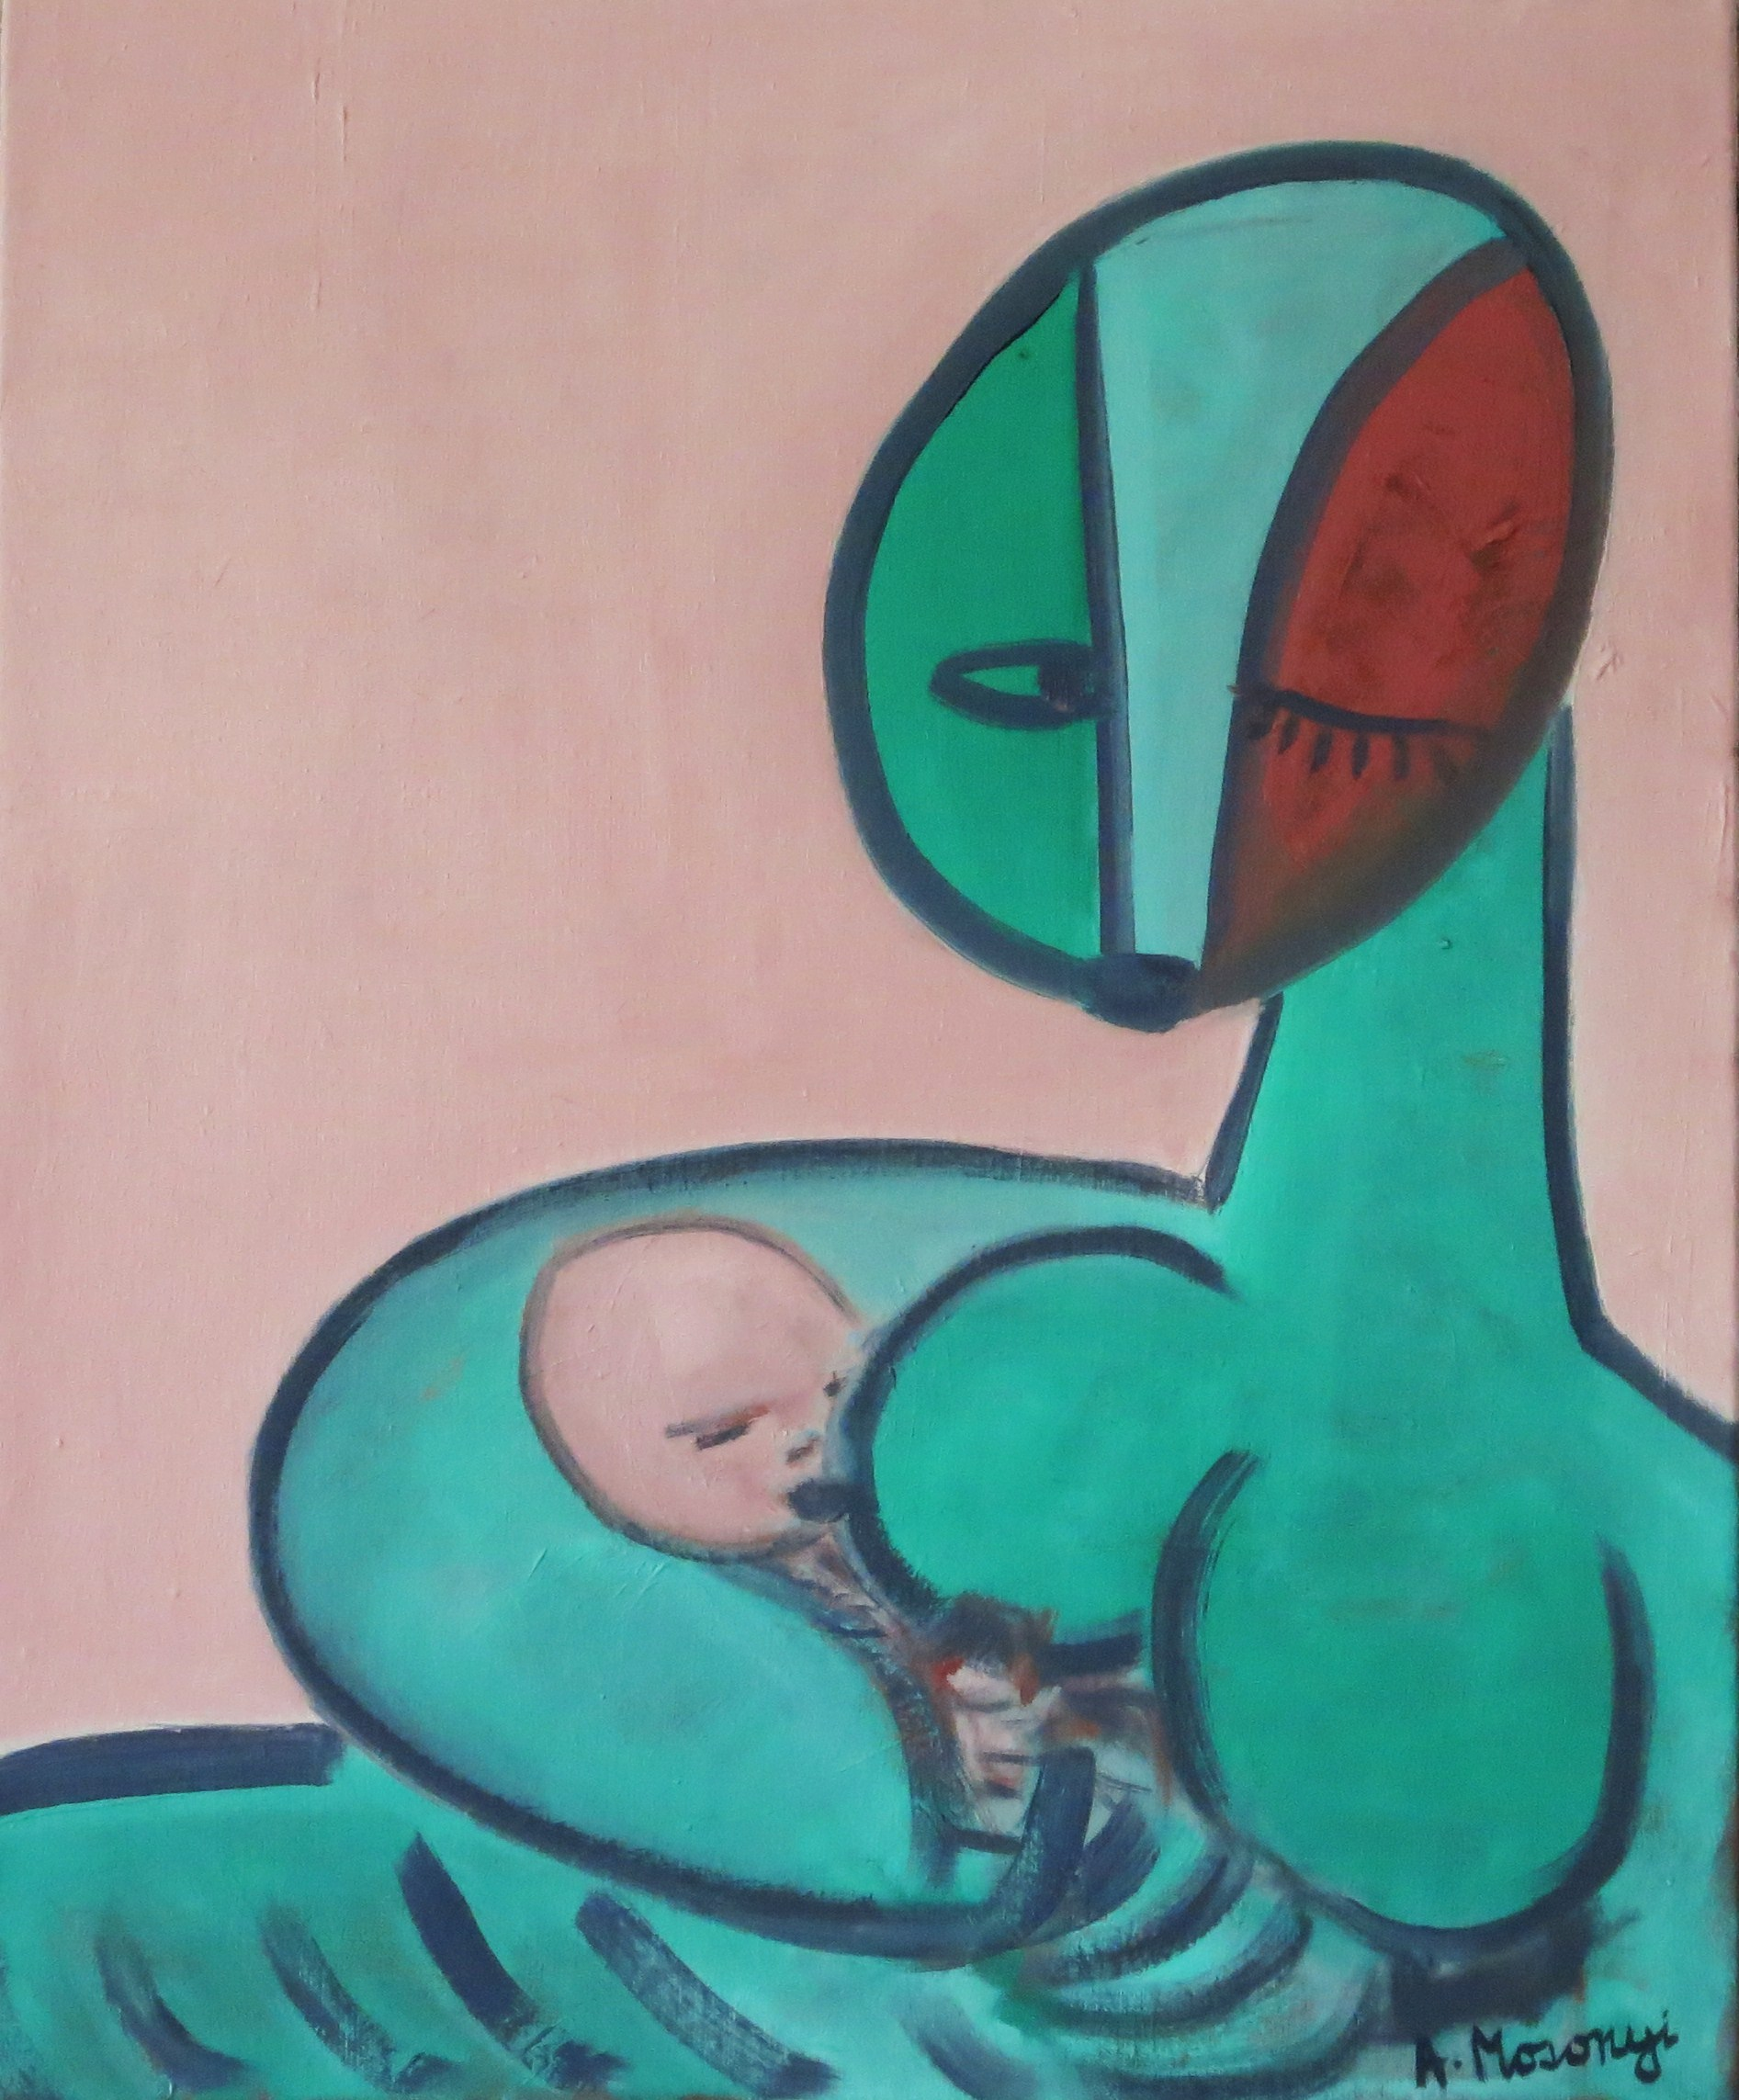 MB1 mother & babe 2013 huile sur toile 73 x 60 cm